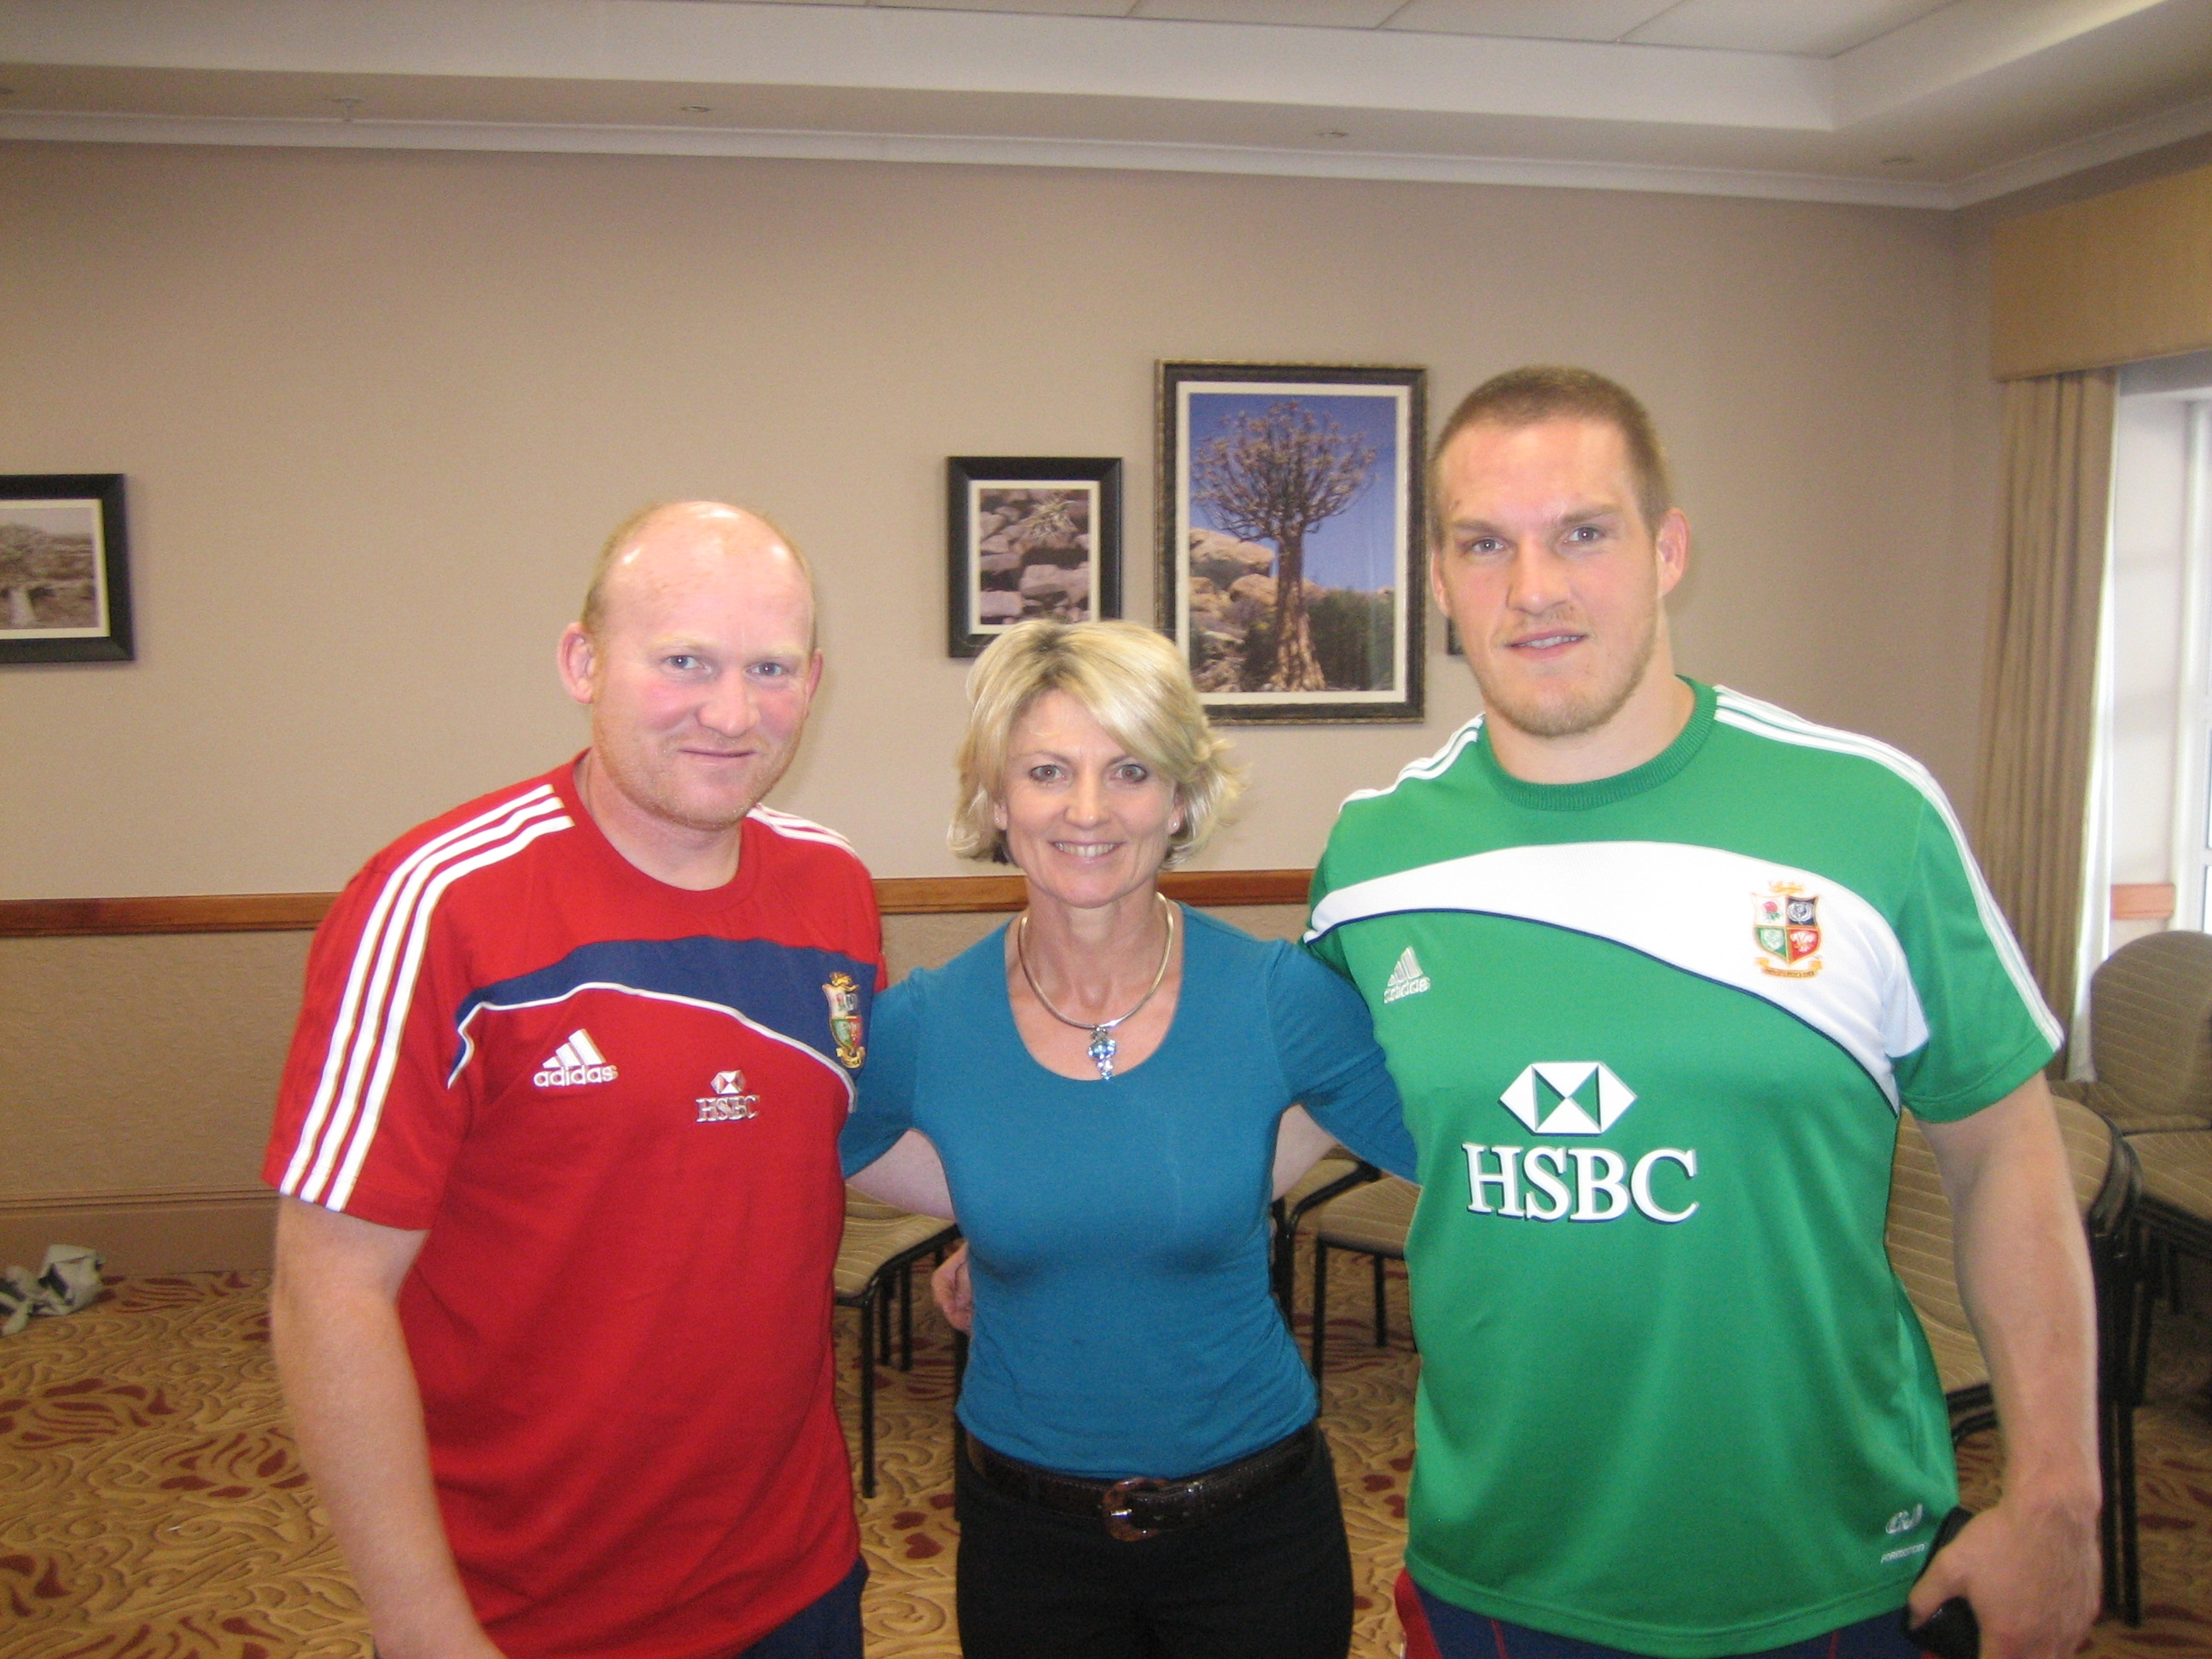 Neil Jenkins, Brigitte Jenkinson & Gethin Jenkins British Irish Lions 2009